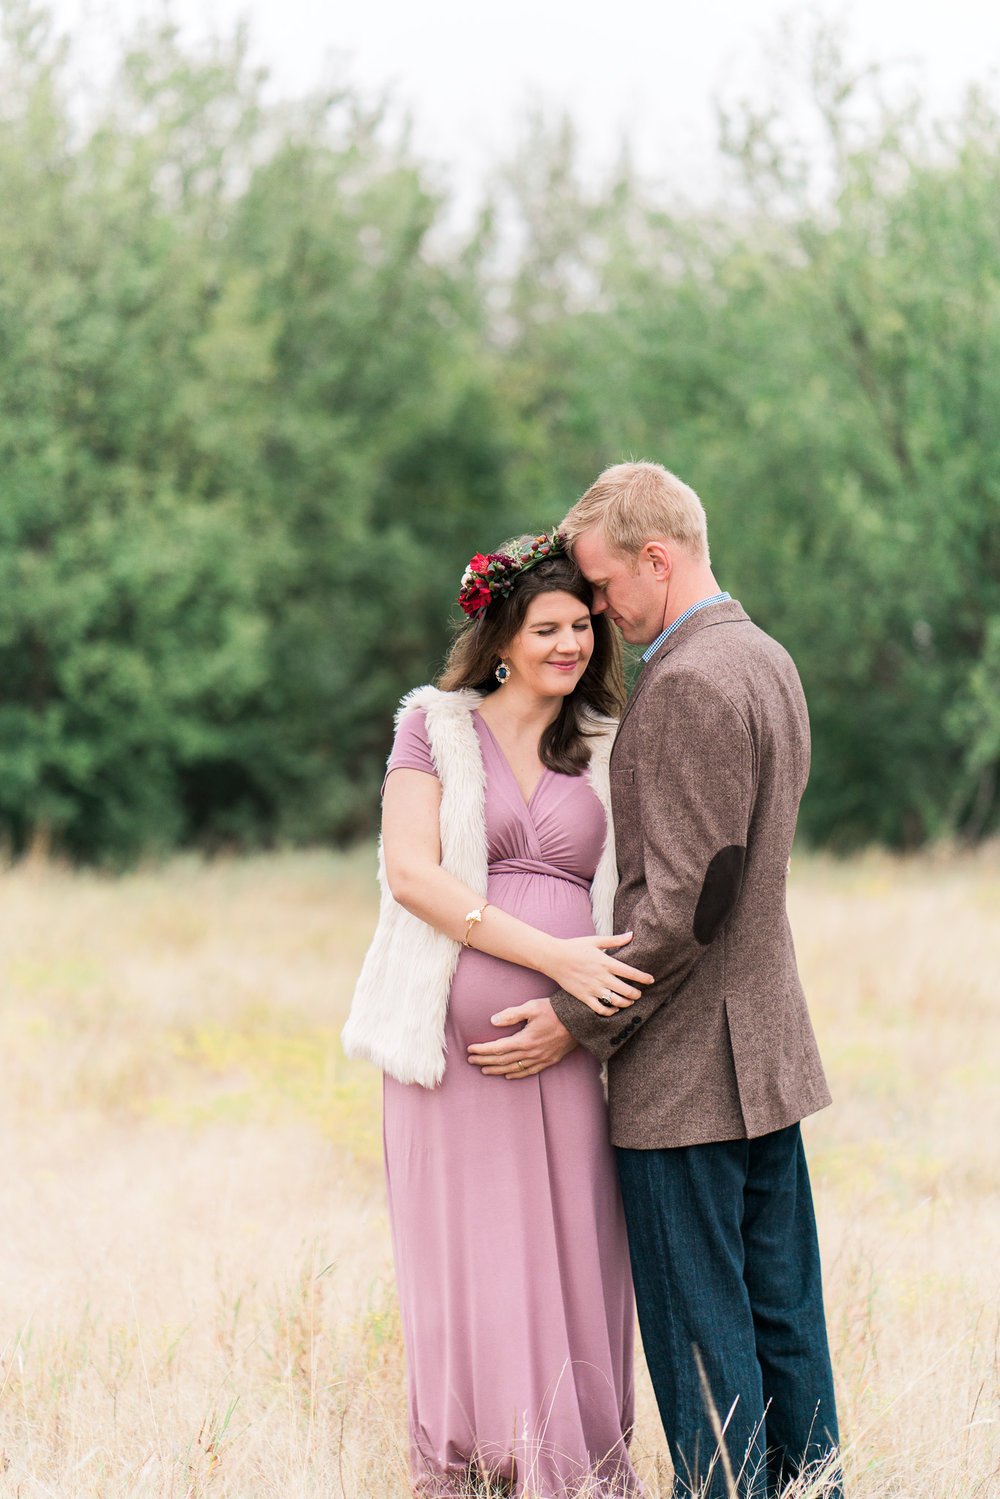 Lizanne-Andrew-Maternity-Kate-Bernard-Photography-Web-43.jpg